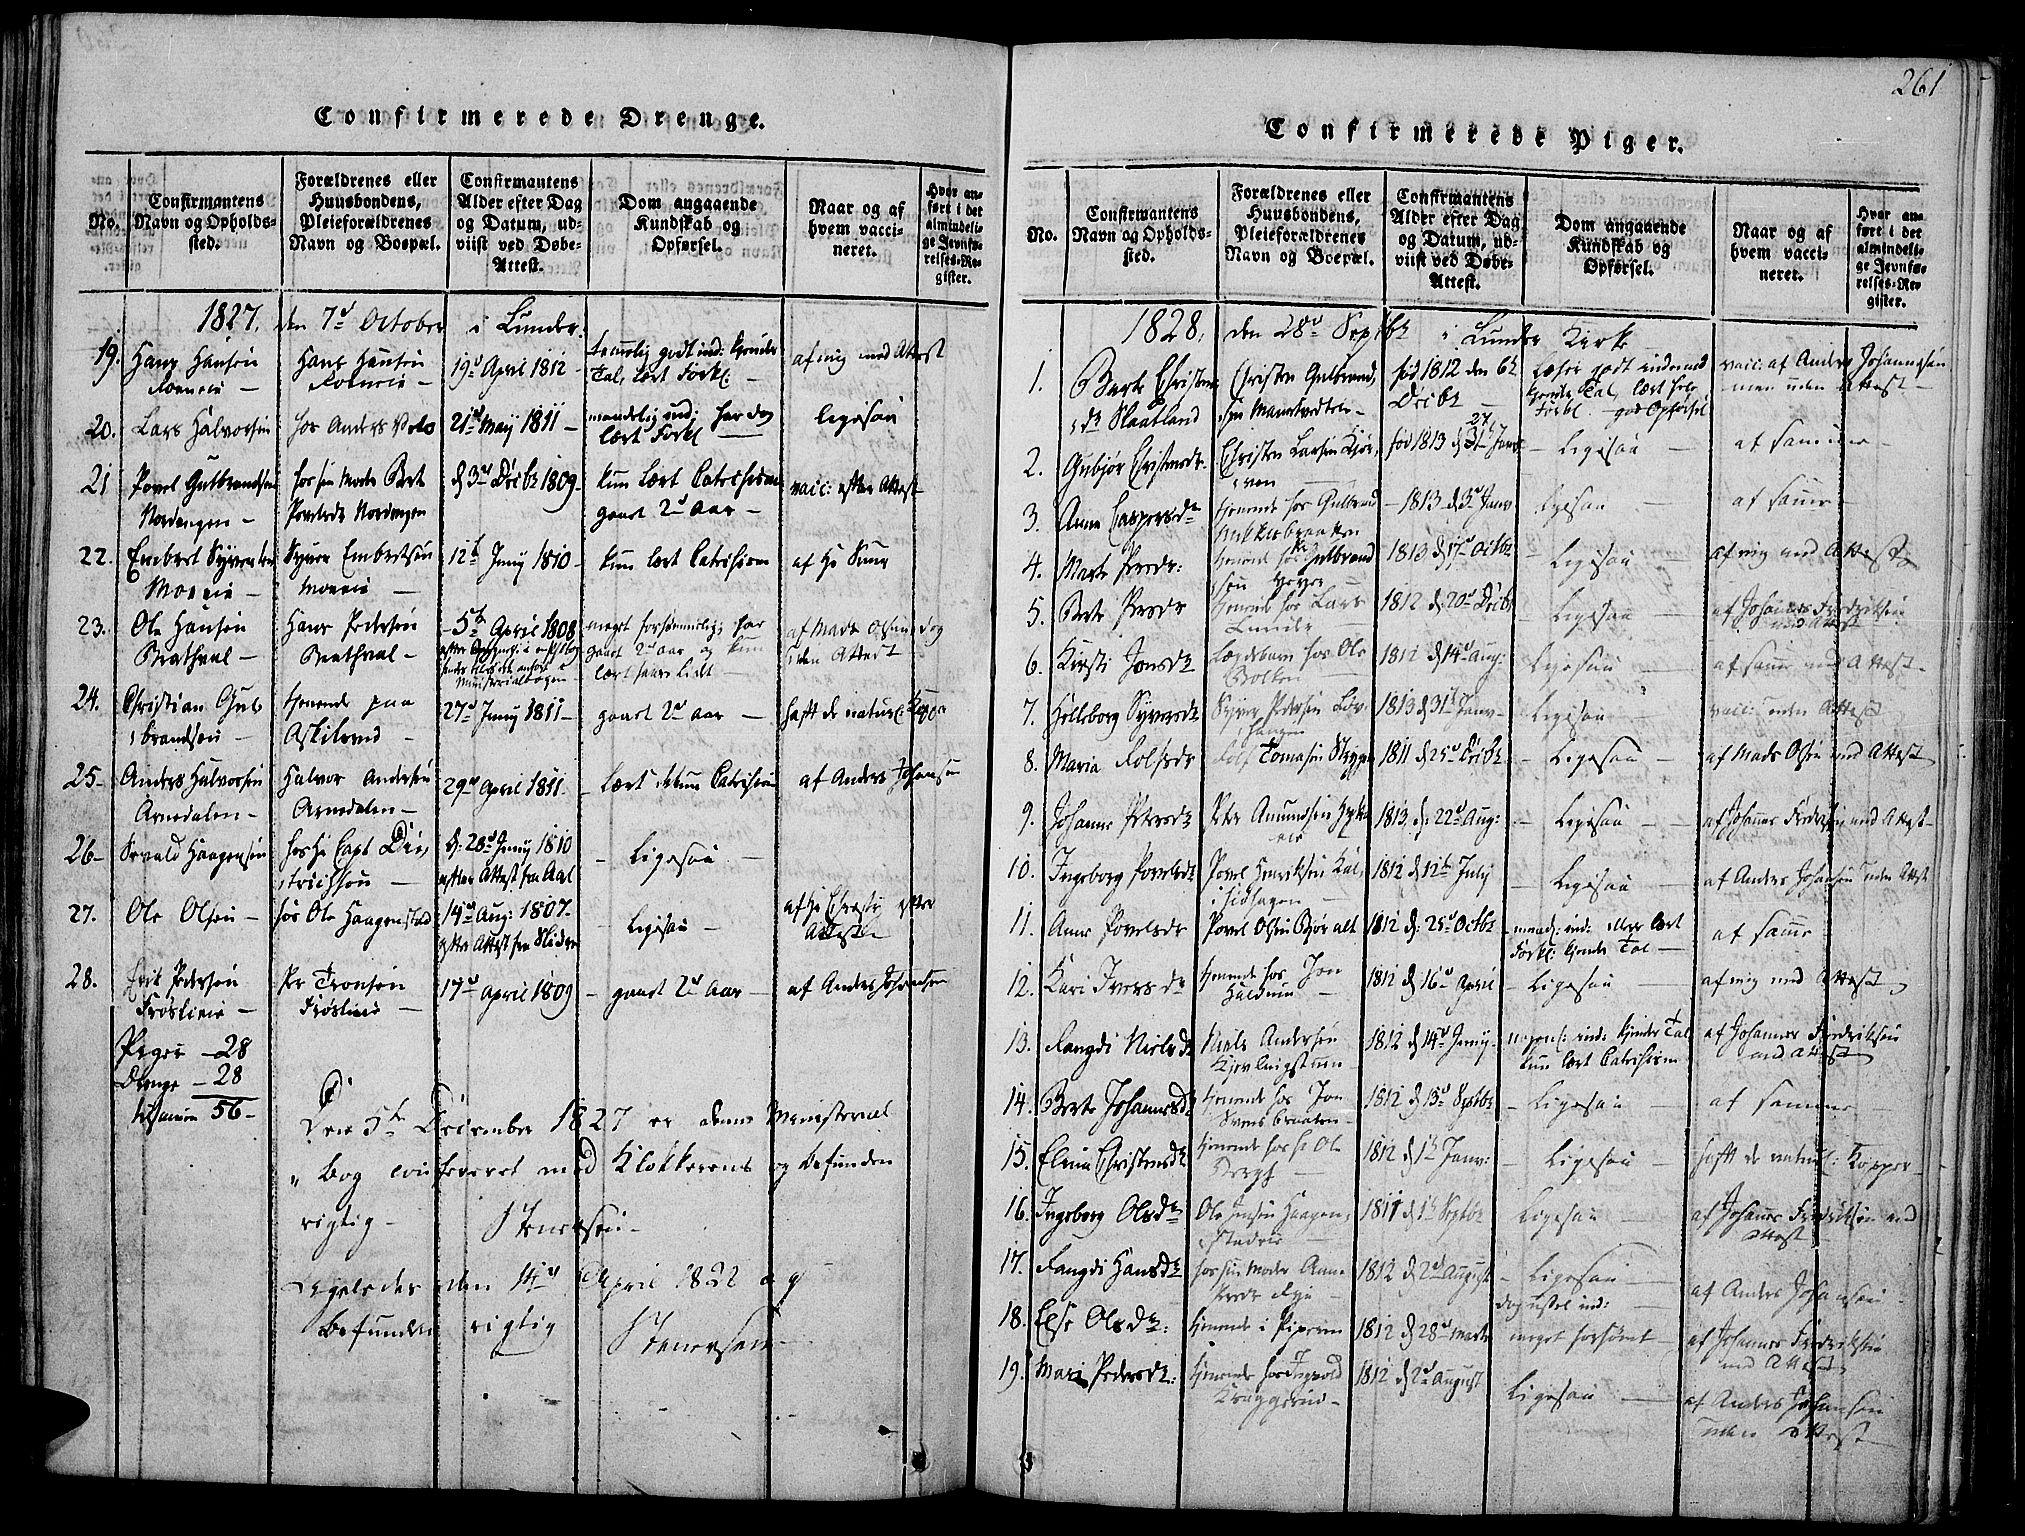 SAH, Jevnaker prestekontor, Ministerialbok nr. 5, 1815-1837, s. 261